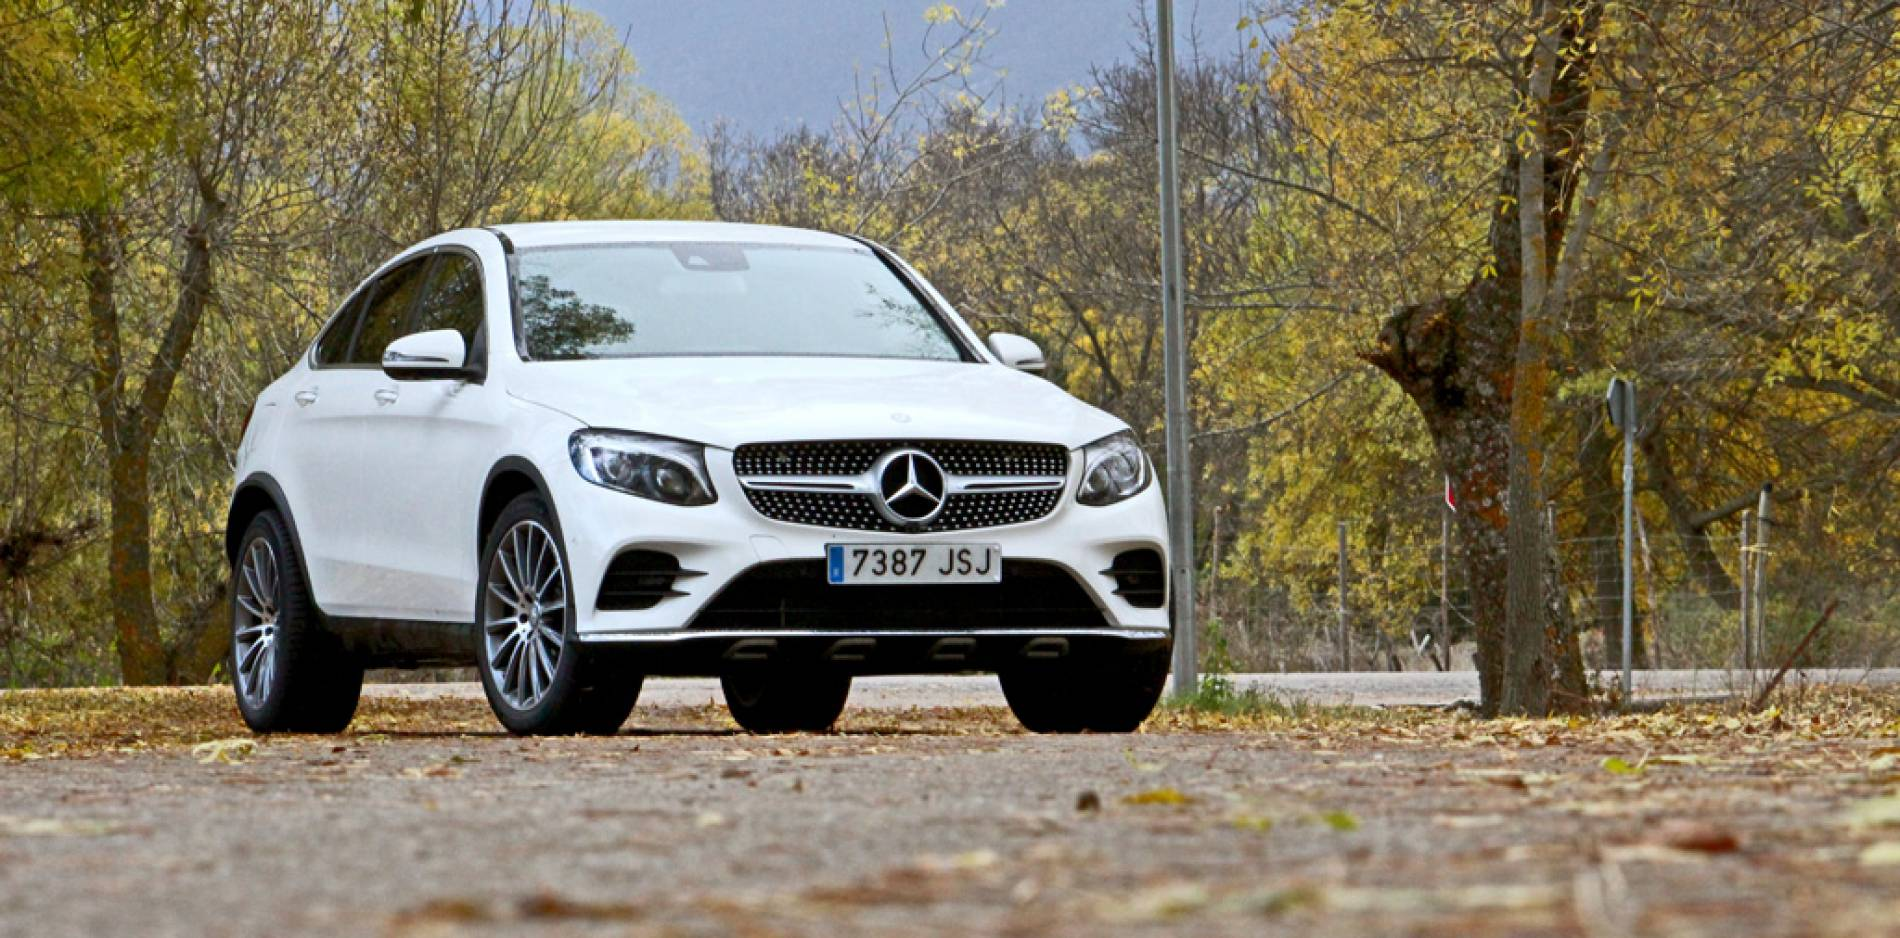 Prueba Mercedes GLC 250d Coupé, tras los pasos del GLE